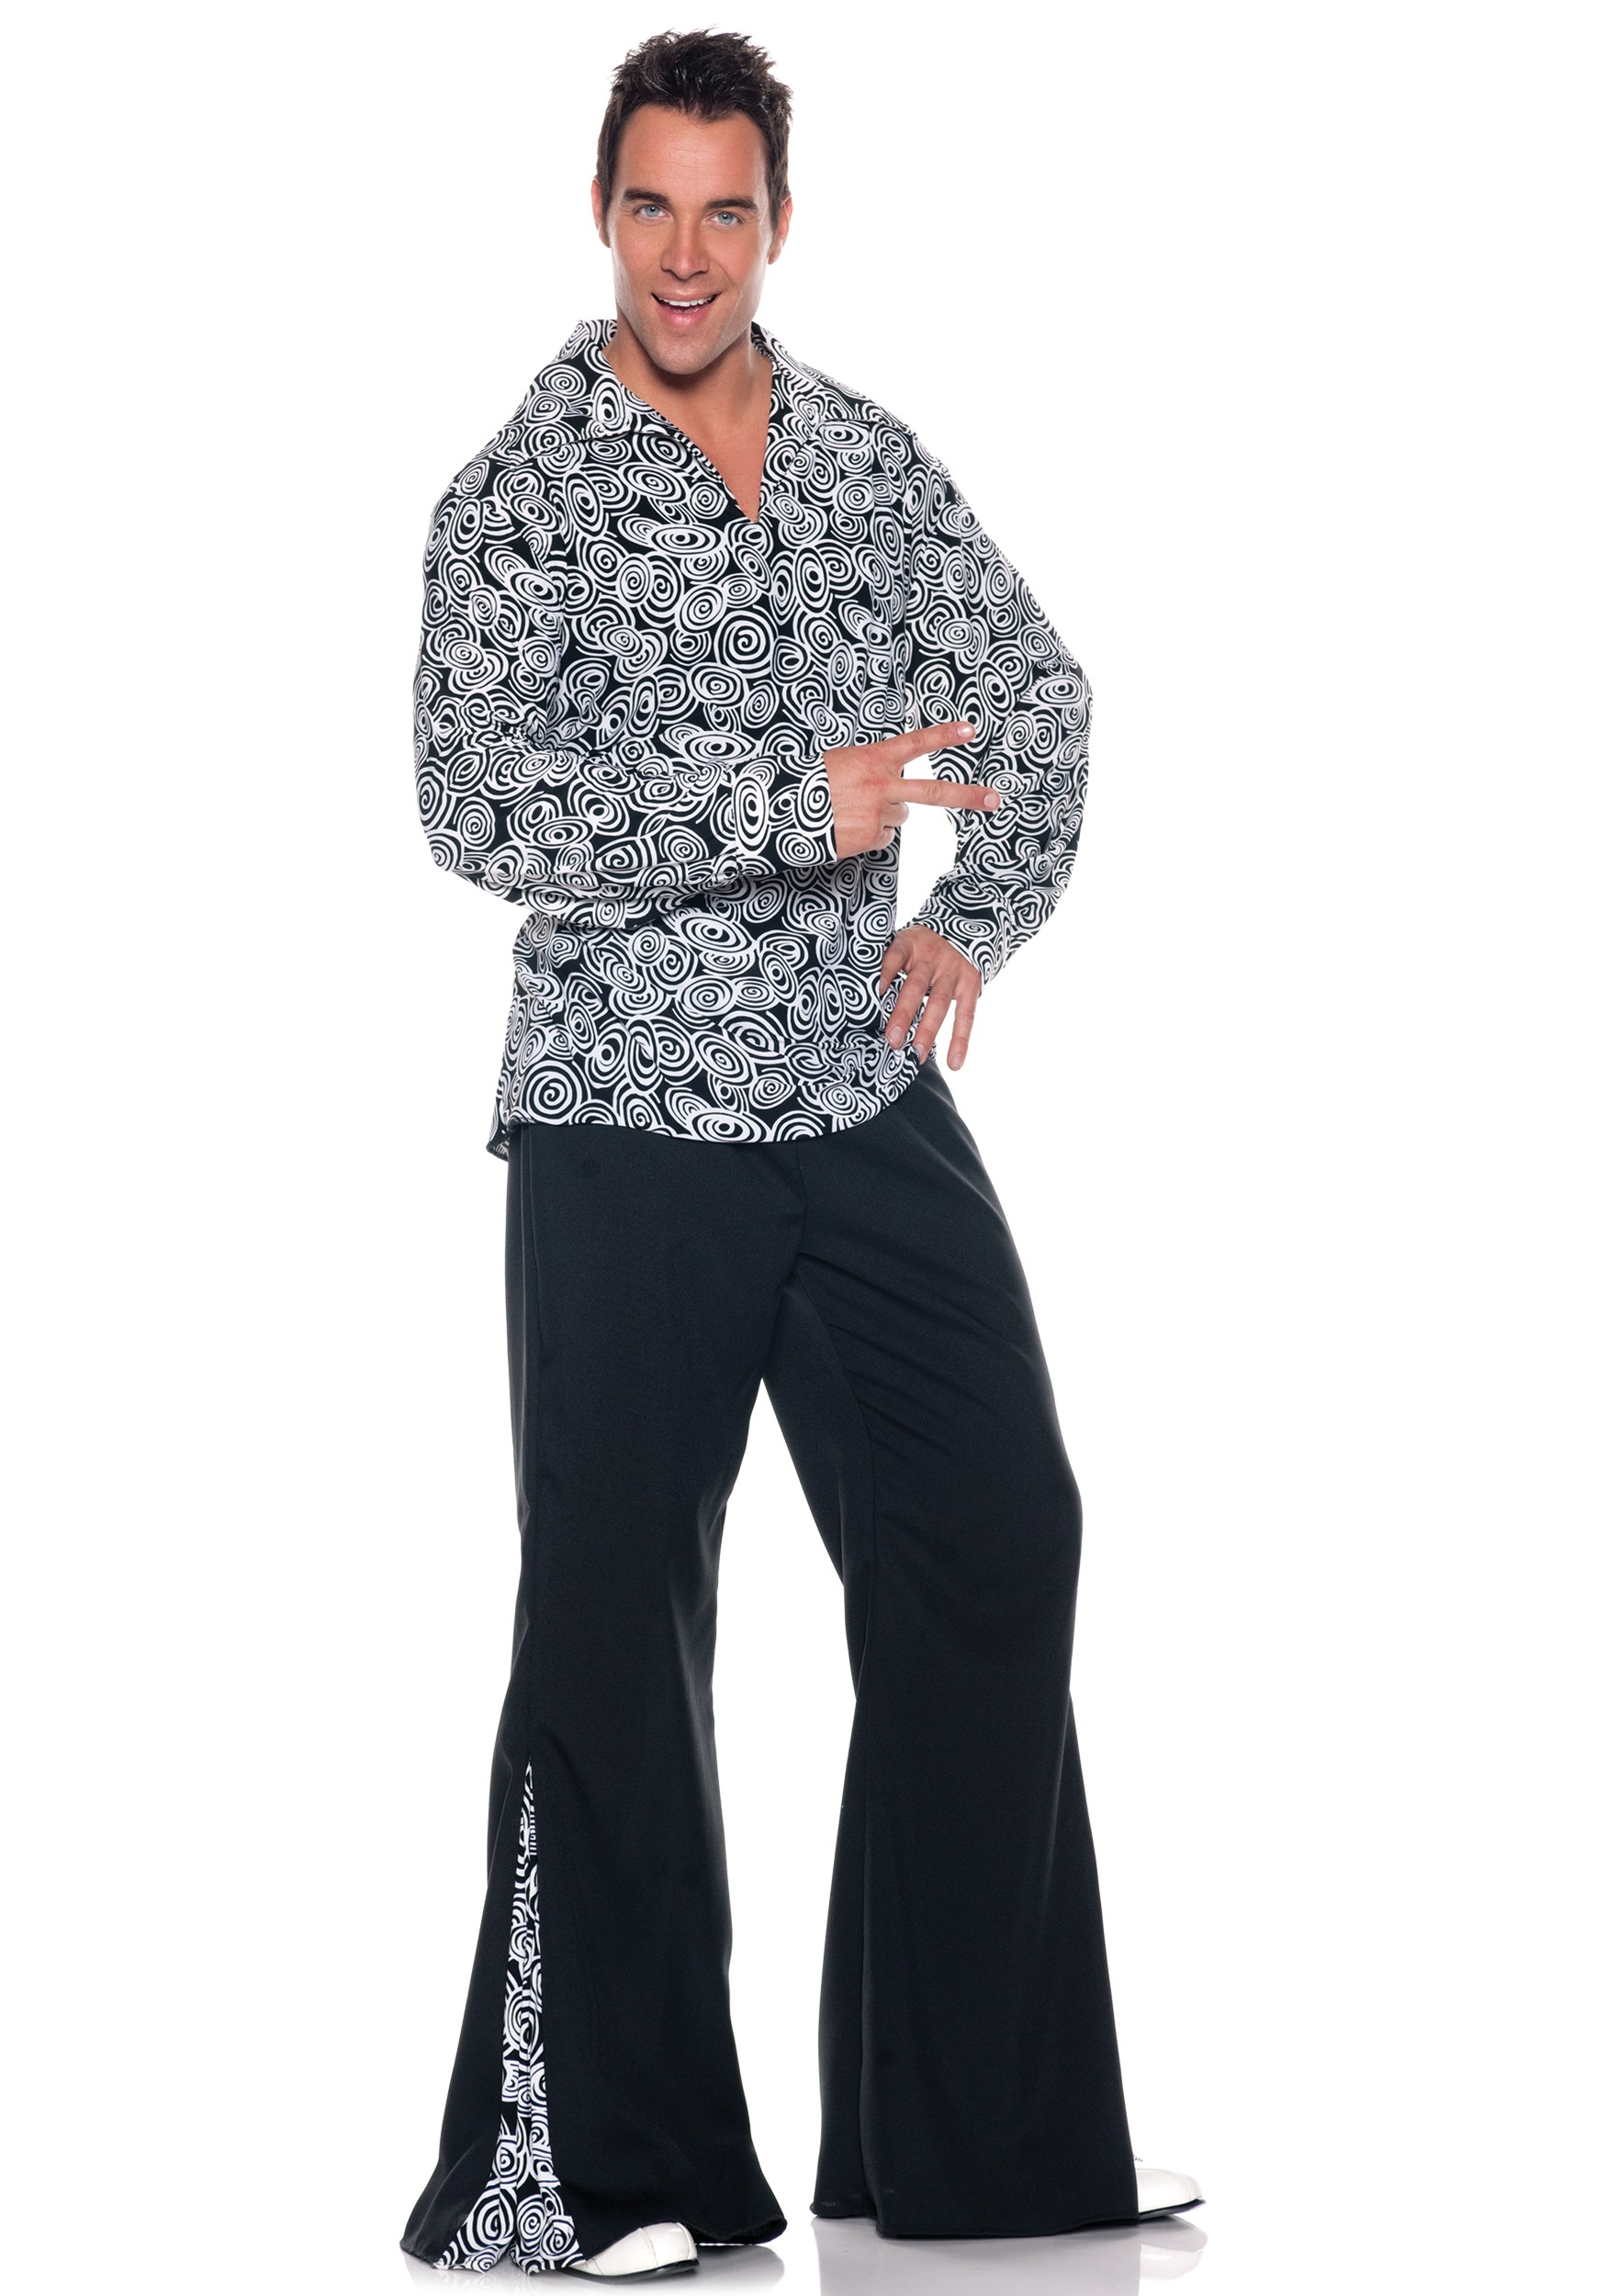 mustache add size st $ 44 99 men s silver glitter disco shoes add size